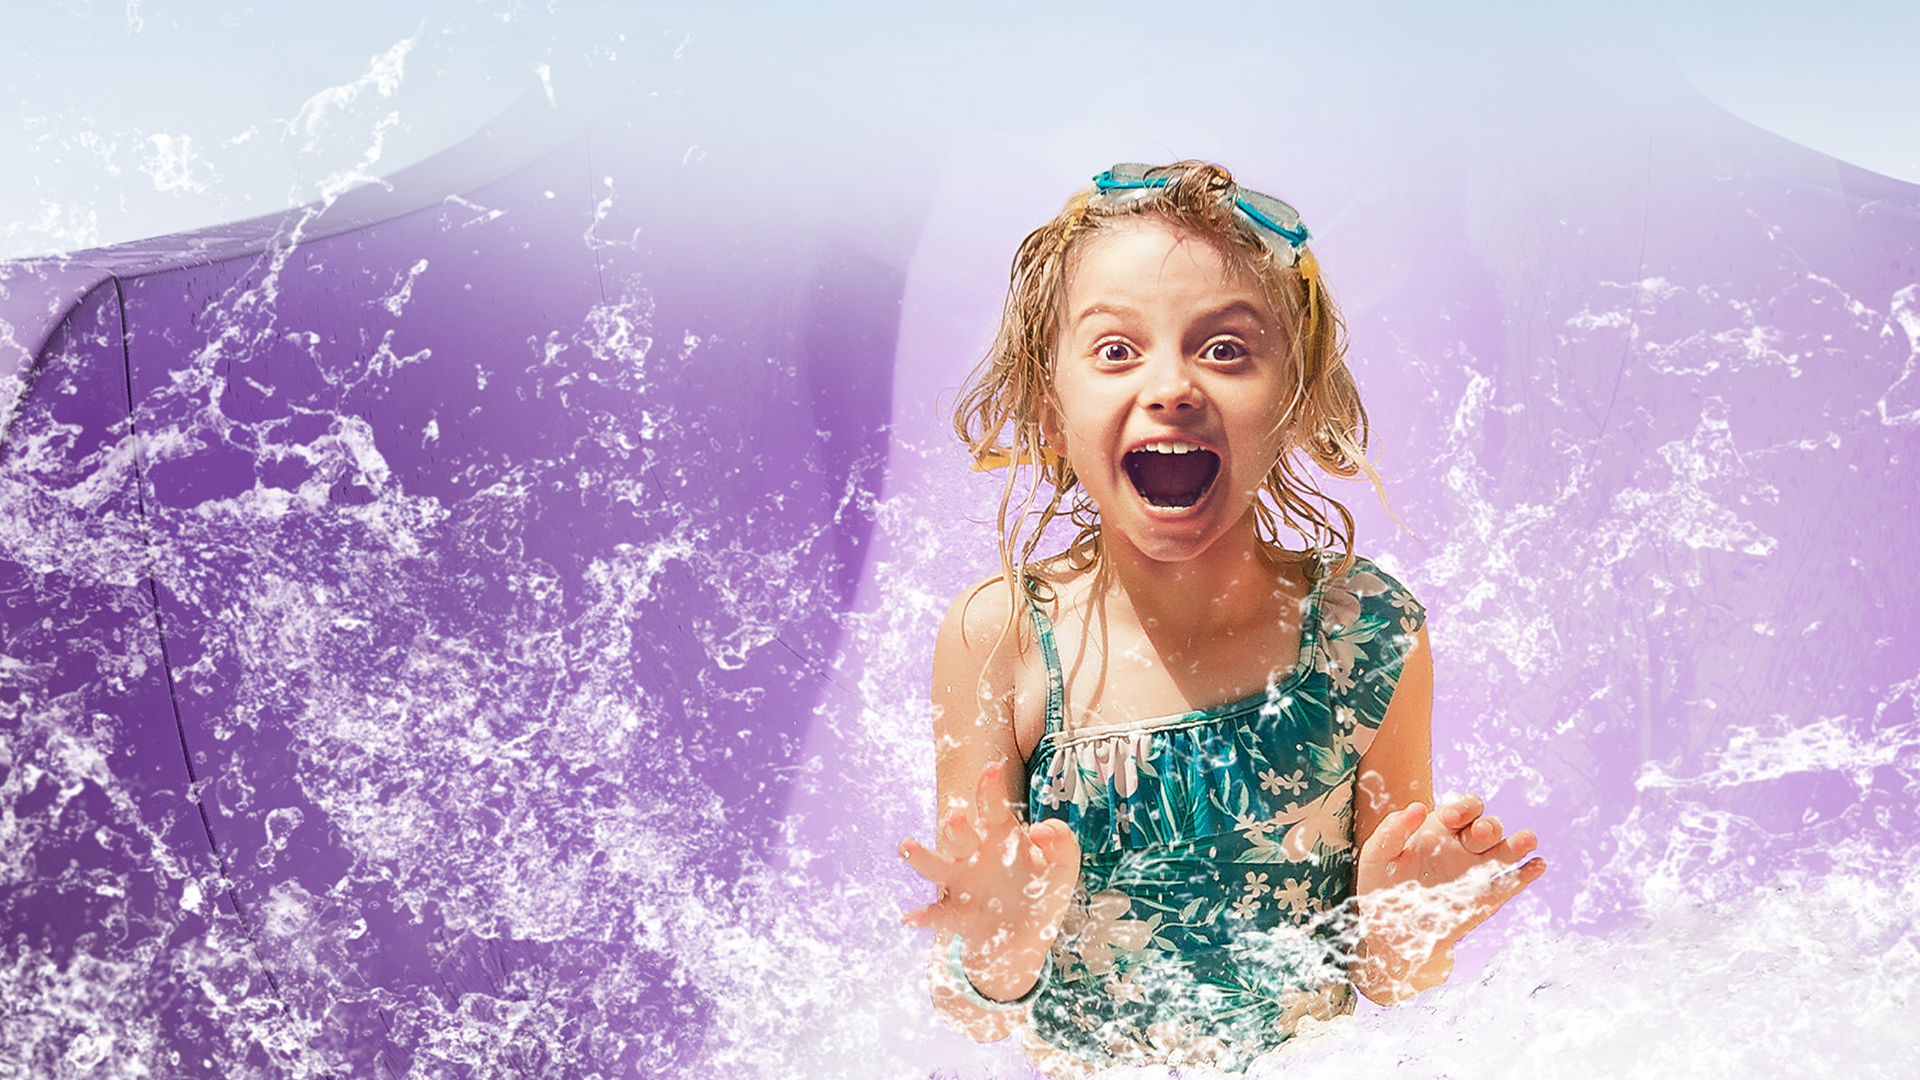 Super Aqua Club Campagne Publicitaire